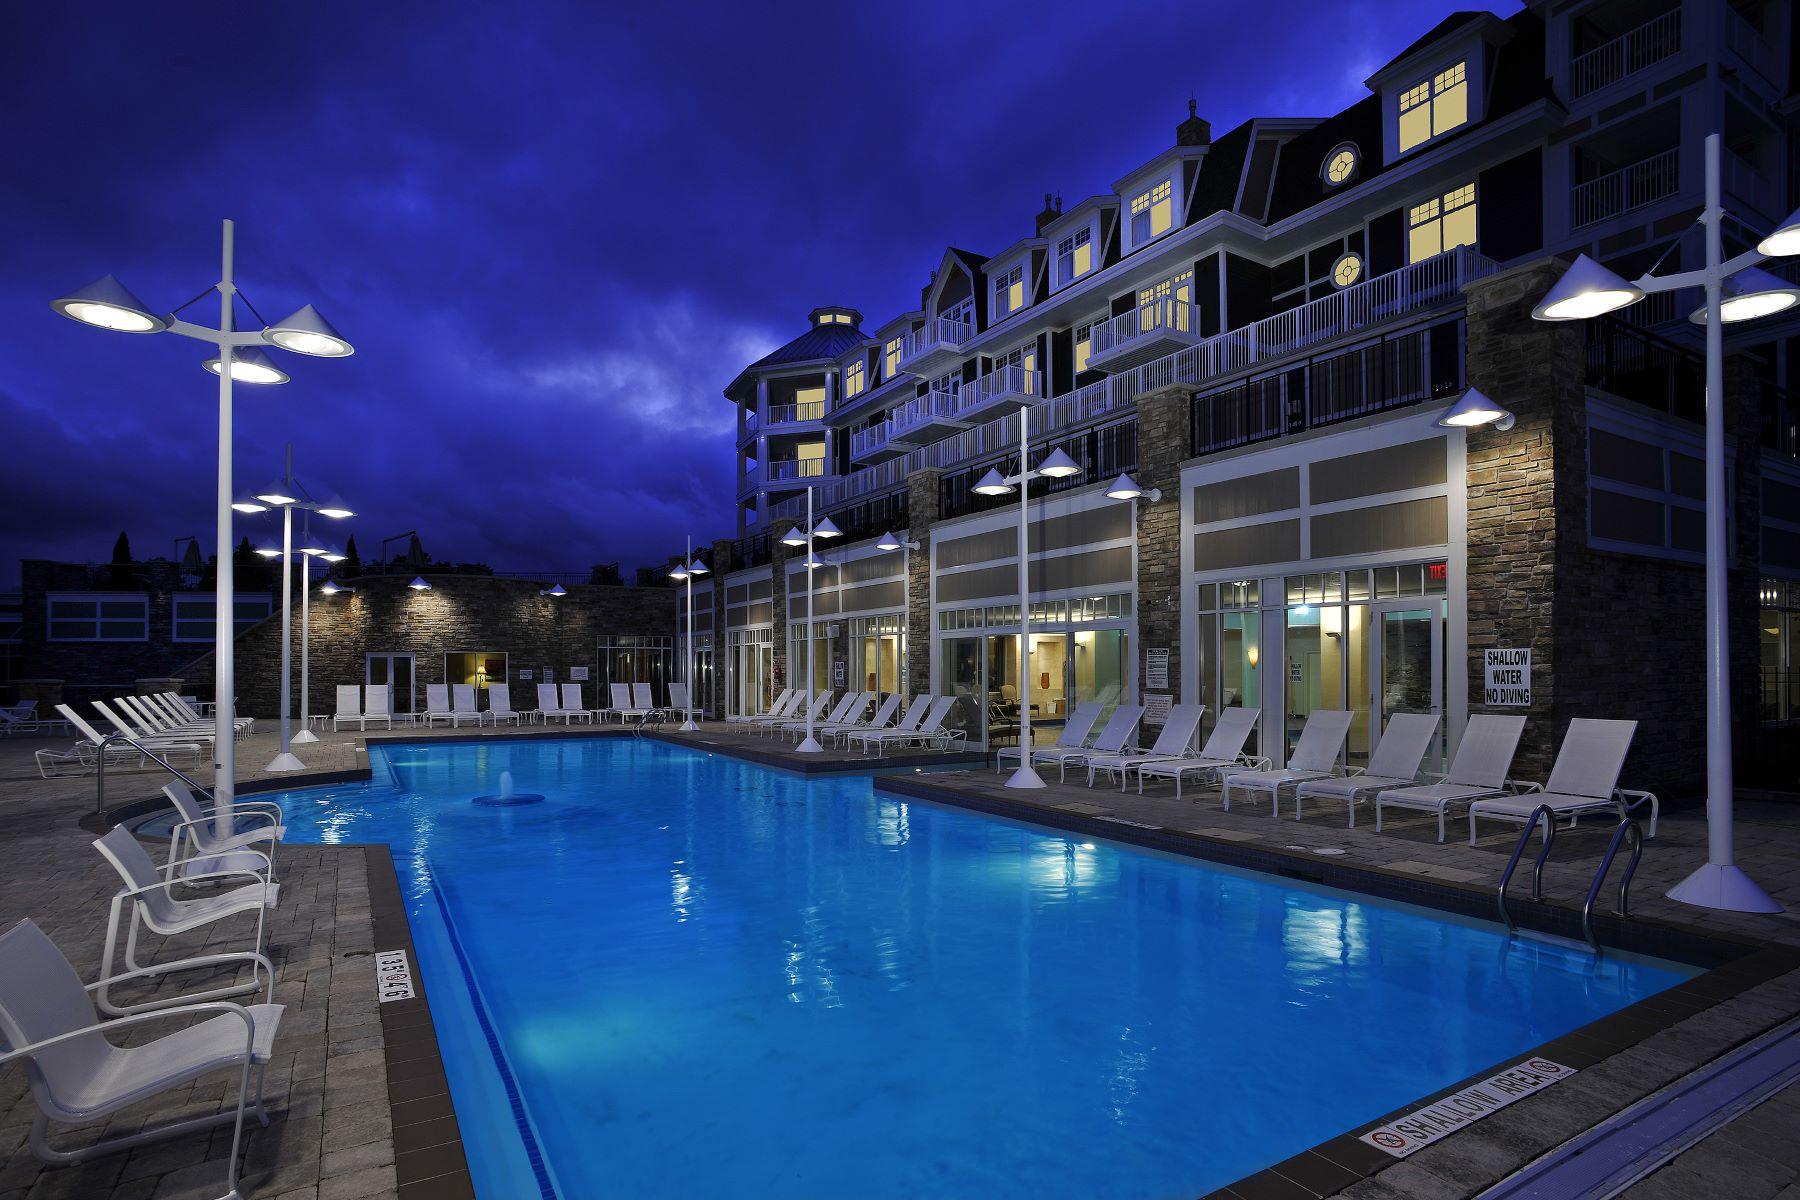 Condomínio para Venda às The Rosseau - J.W. Marriott 1050 Paignton House Rd. Suite 339, Minett, Ontario, P0B 1G0 Canadá